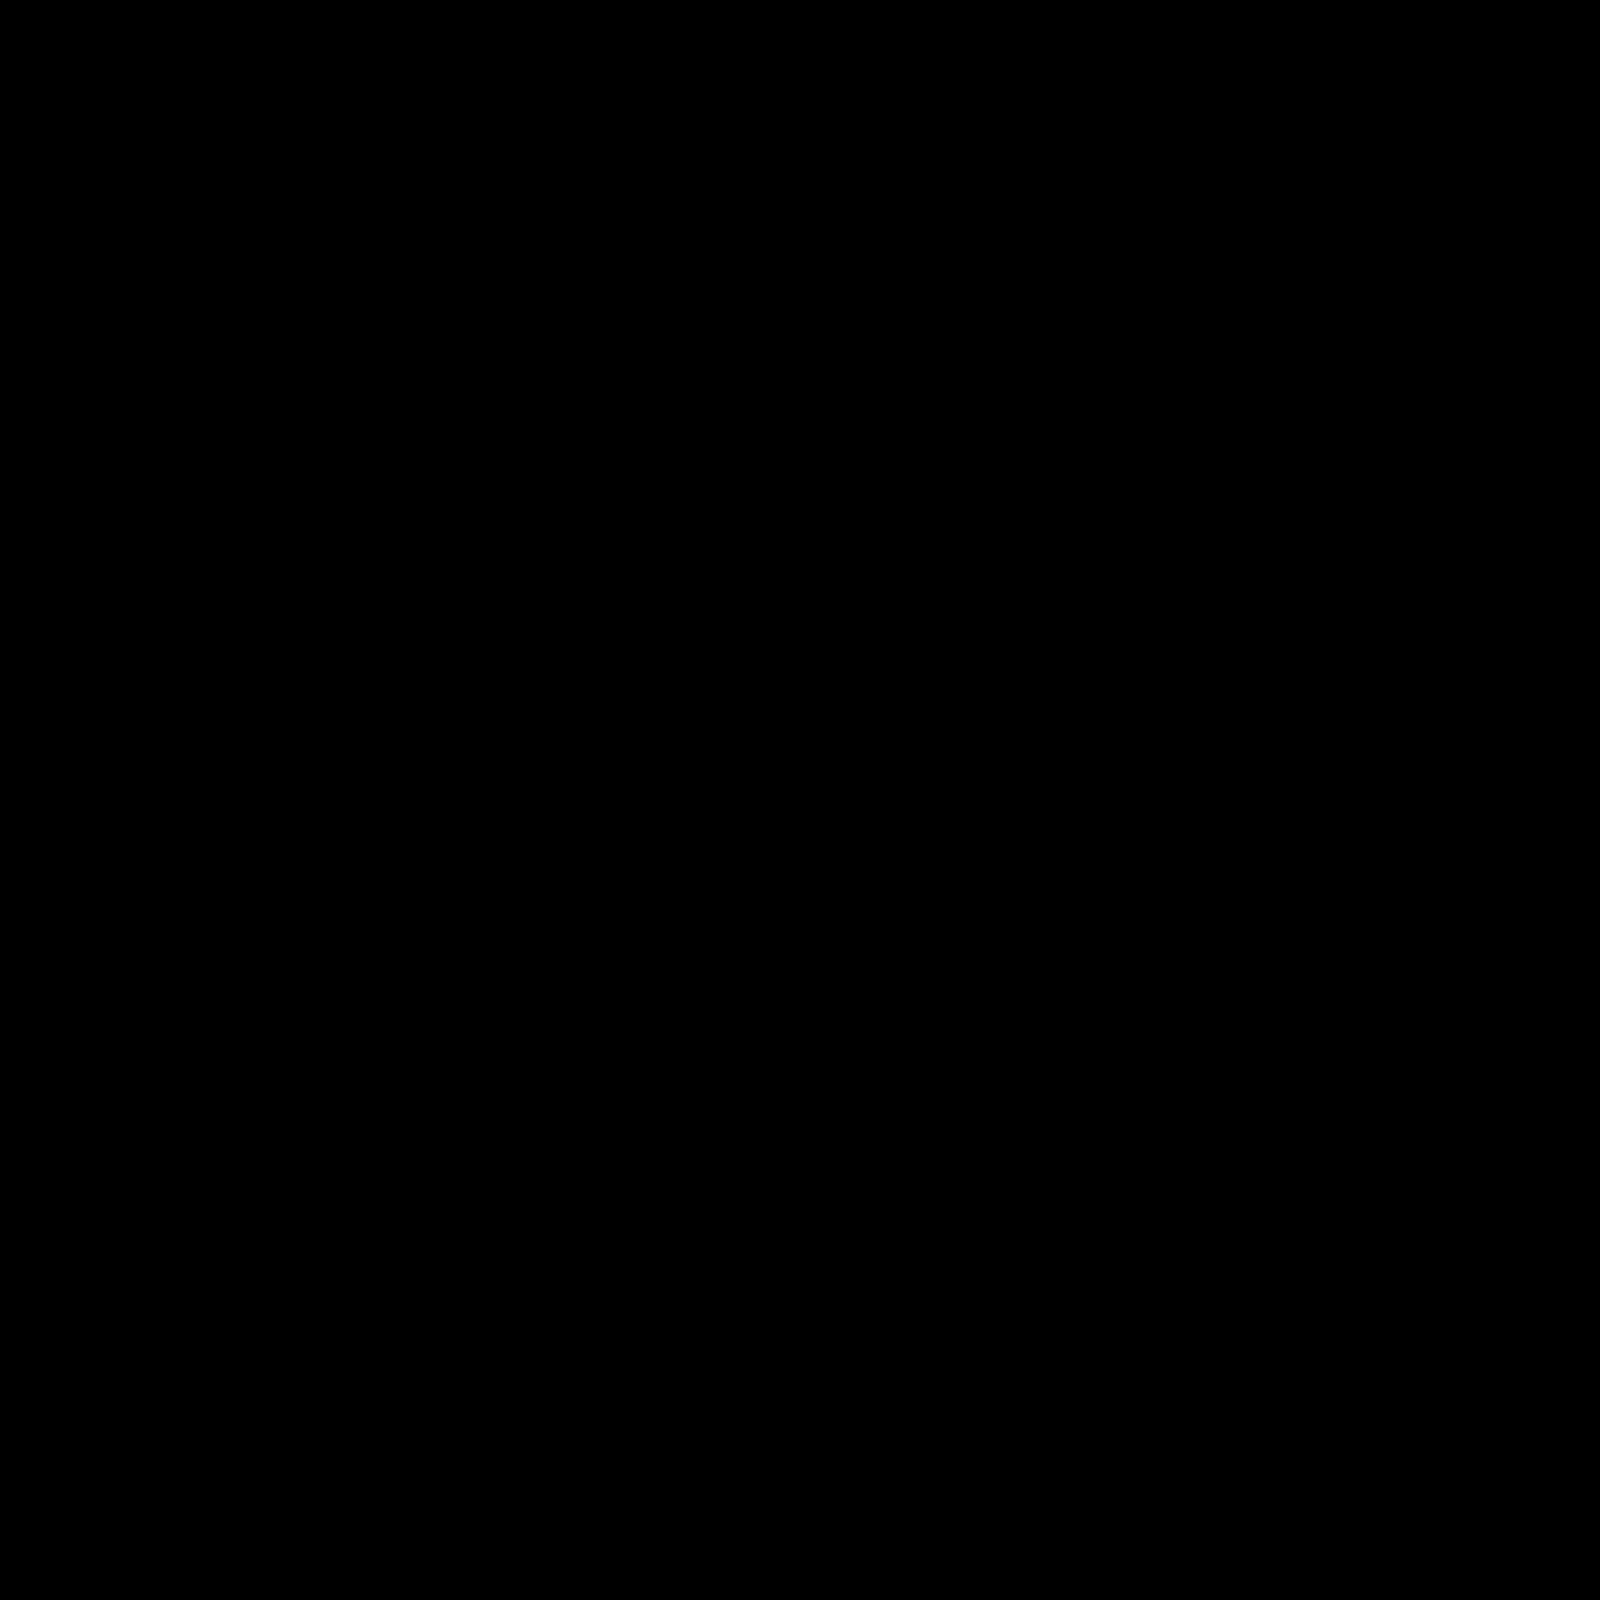 1600x1600 Home Icon